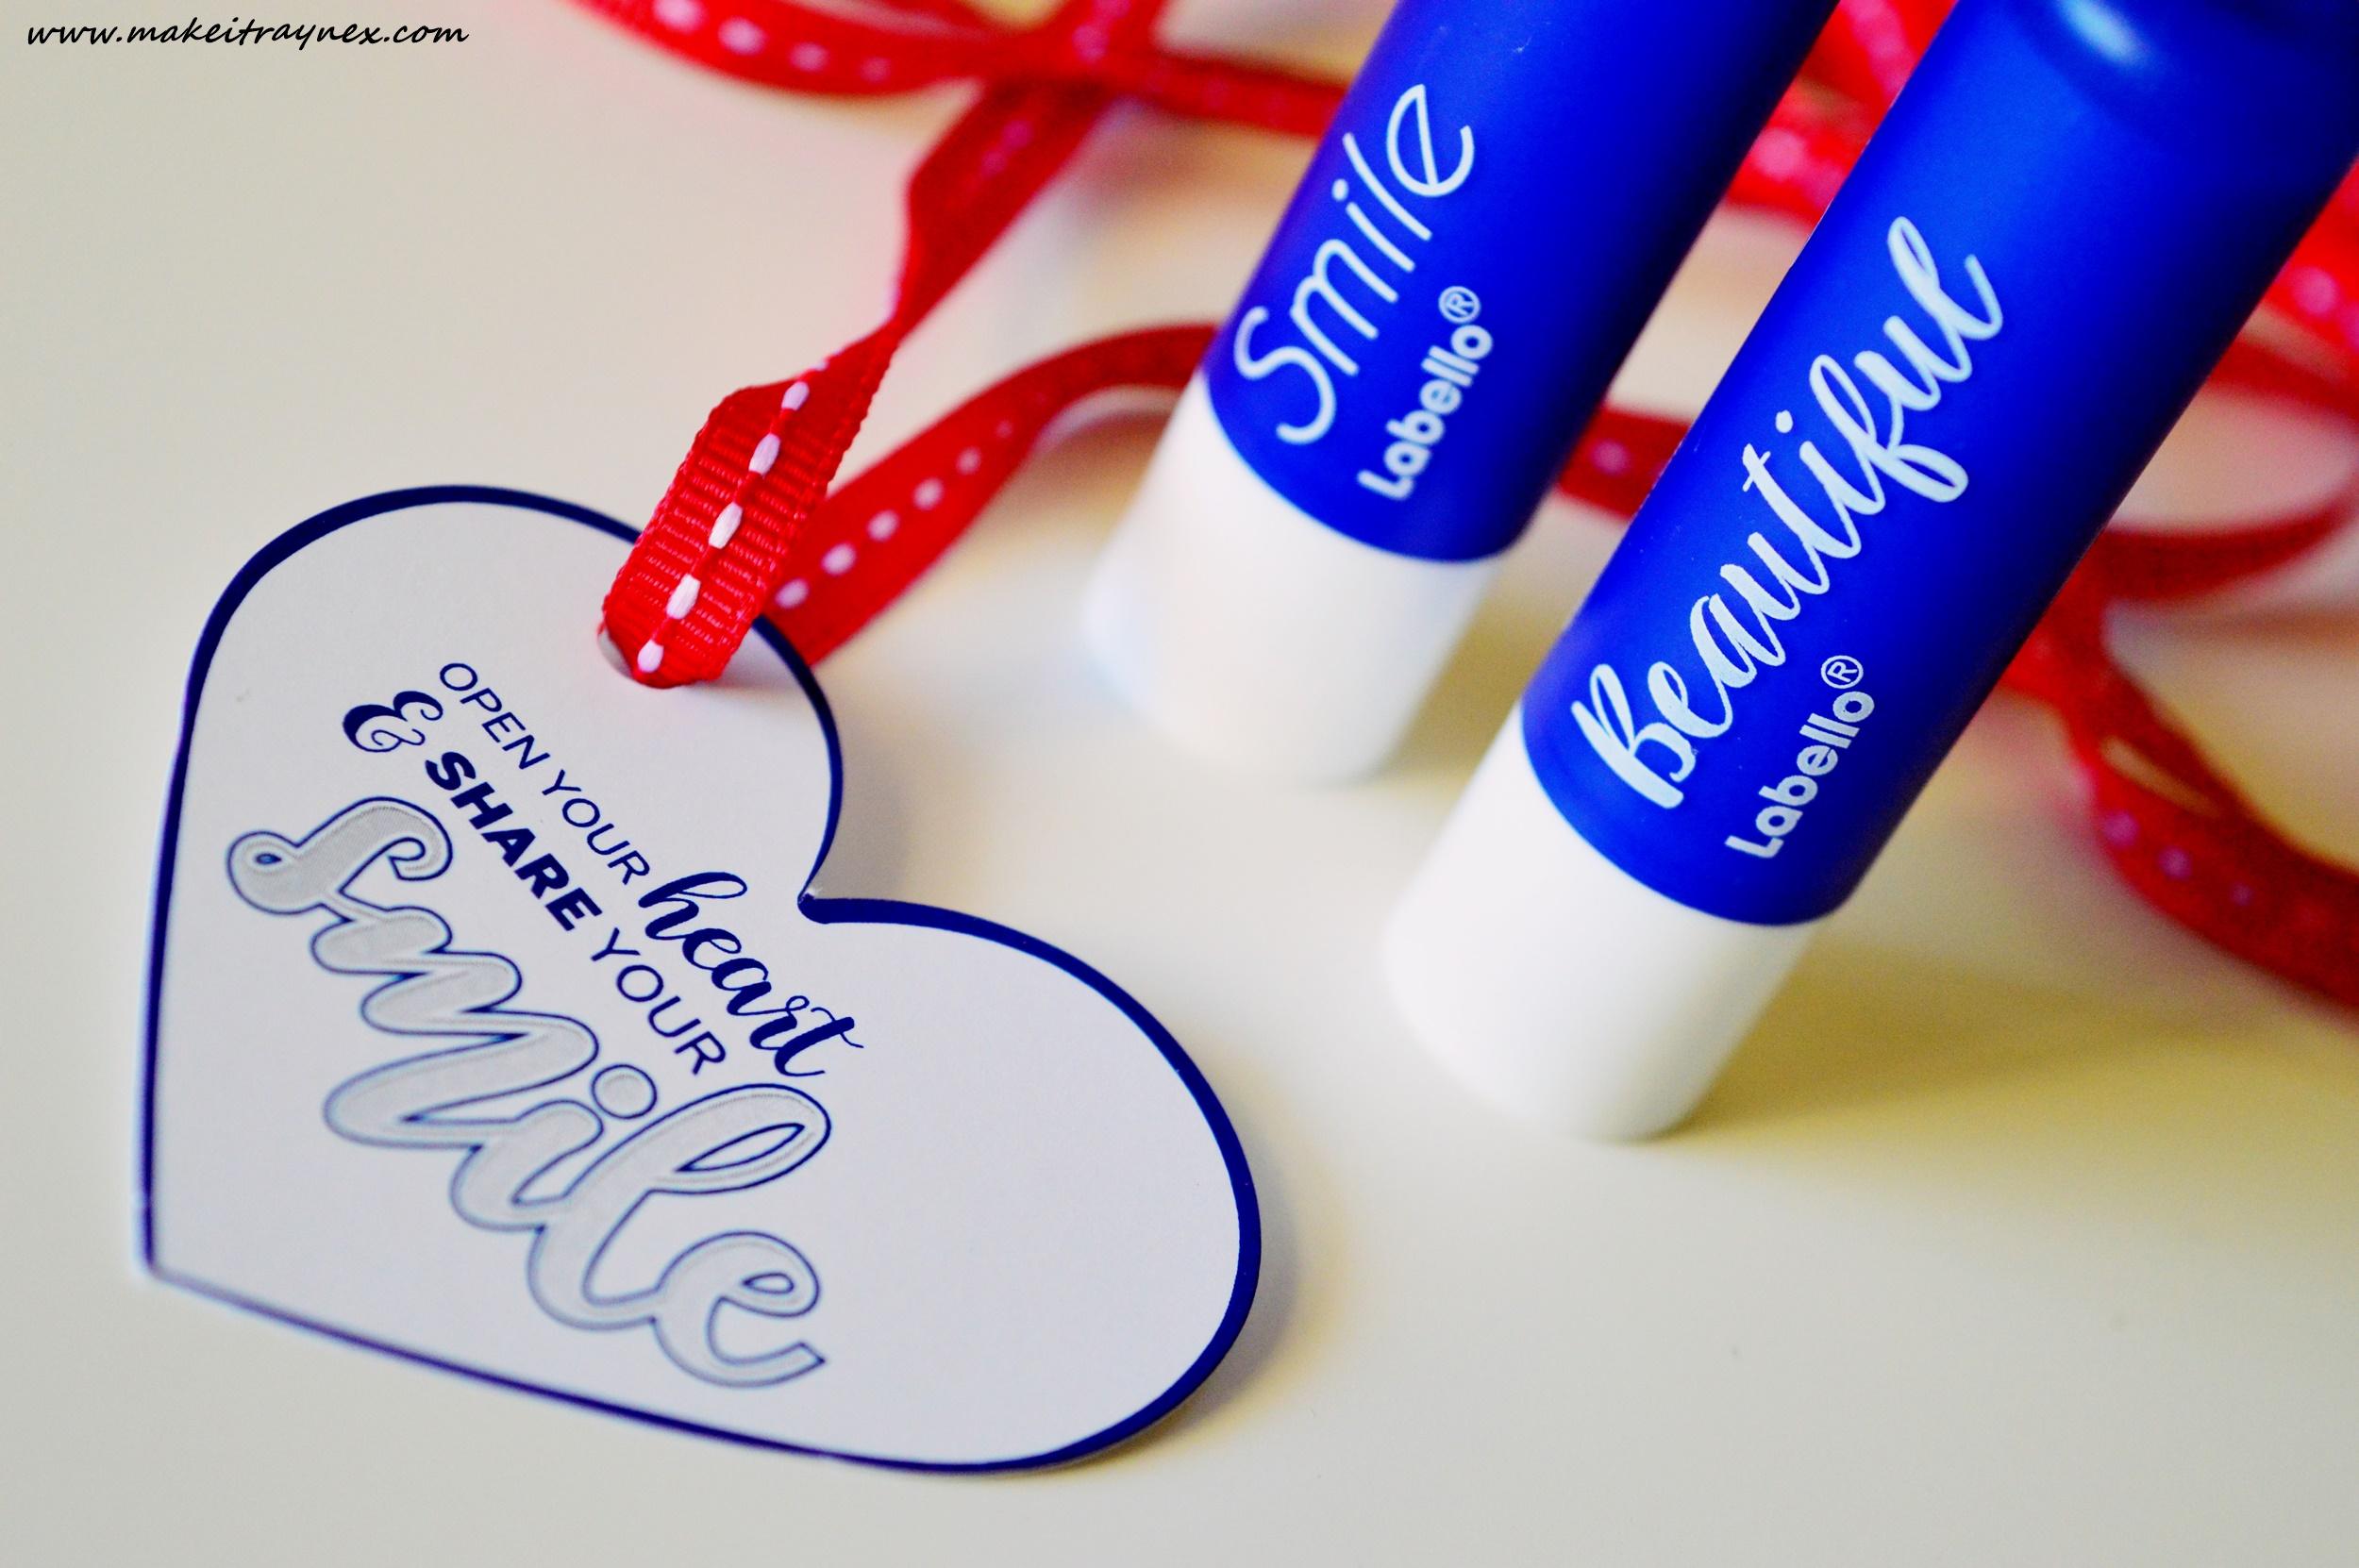 Join Labello & Donate to the Smile Foundation! #LabelloSmileChallenge